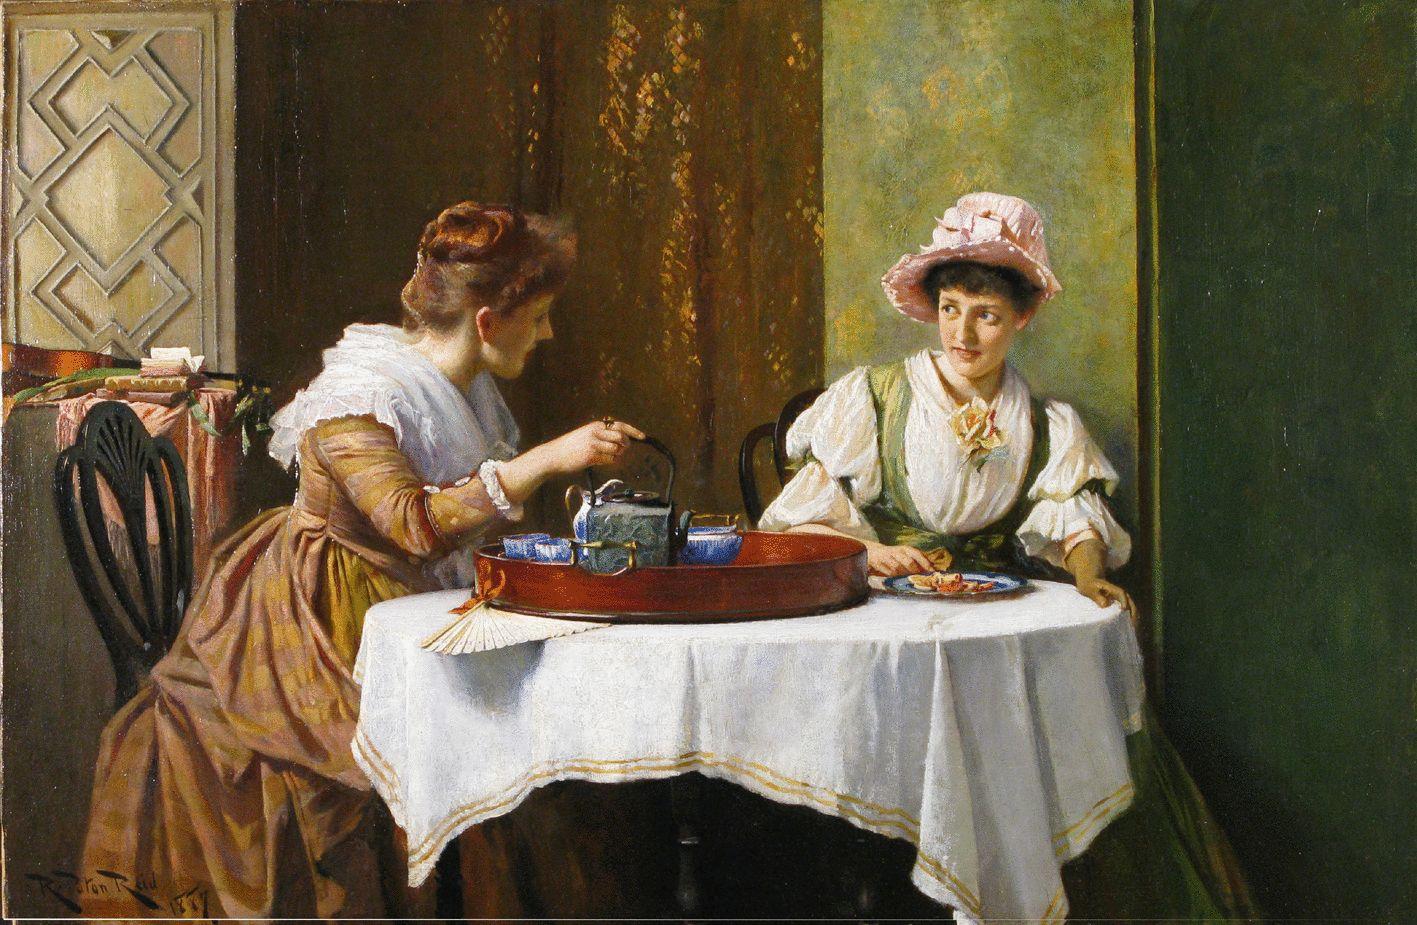 A Little Tea & Gossip by ROBERT PAYTON REID (scottish, 1859-1945) - Cider House Galleries